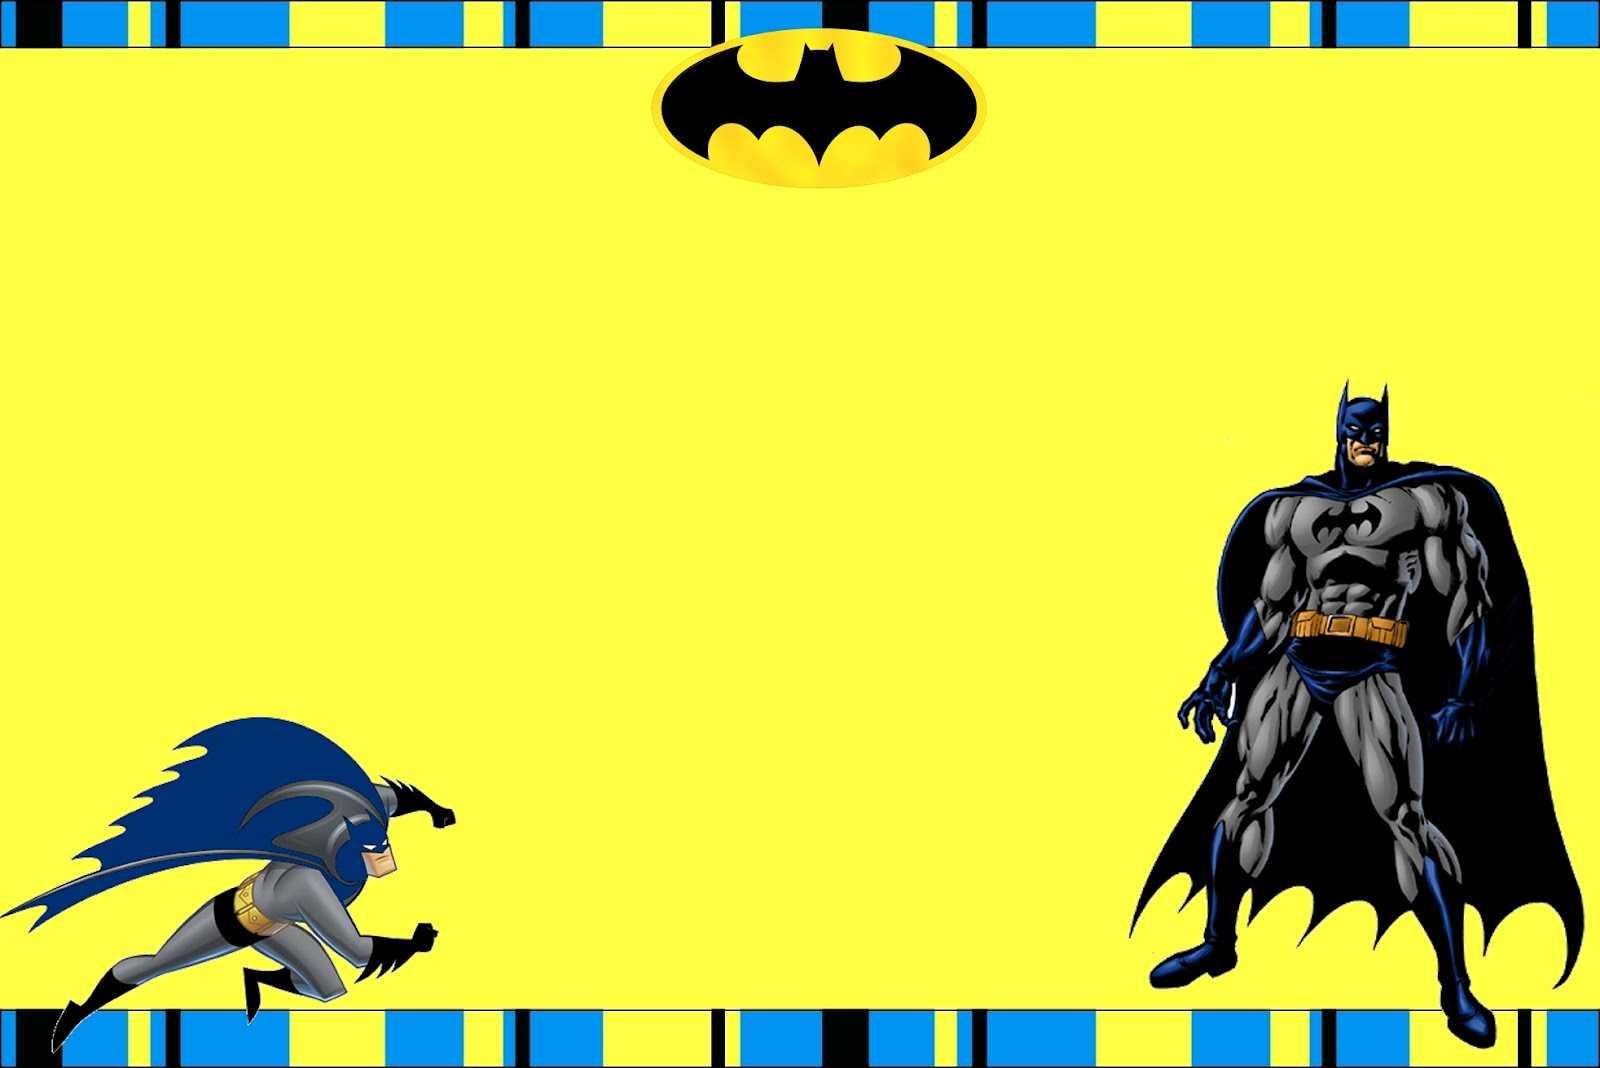 Free Printable Batman Birthday Invitations For Batman Birthday Card Template